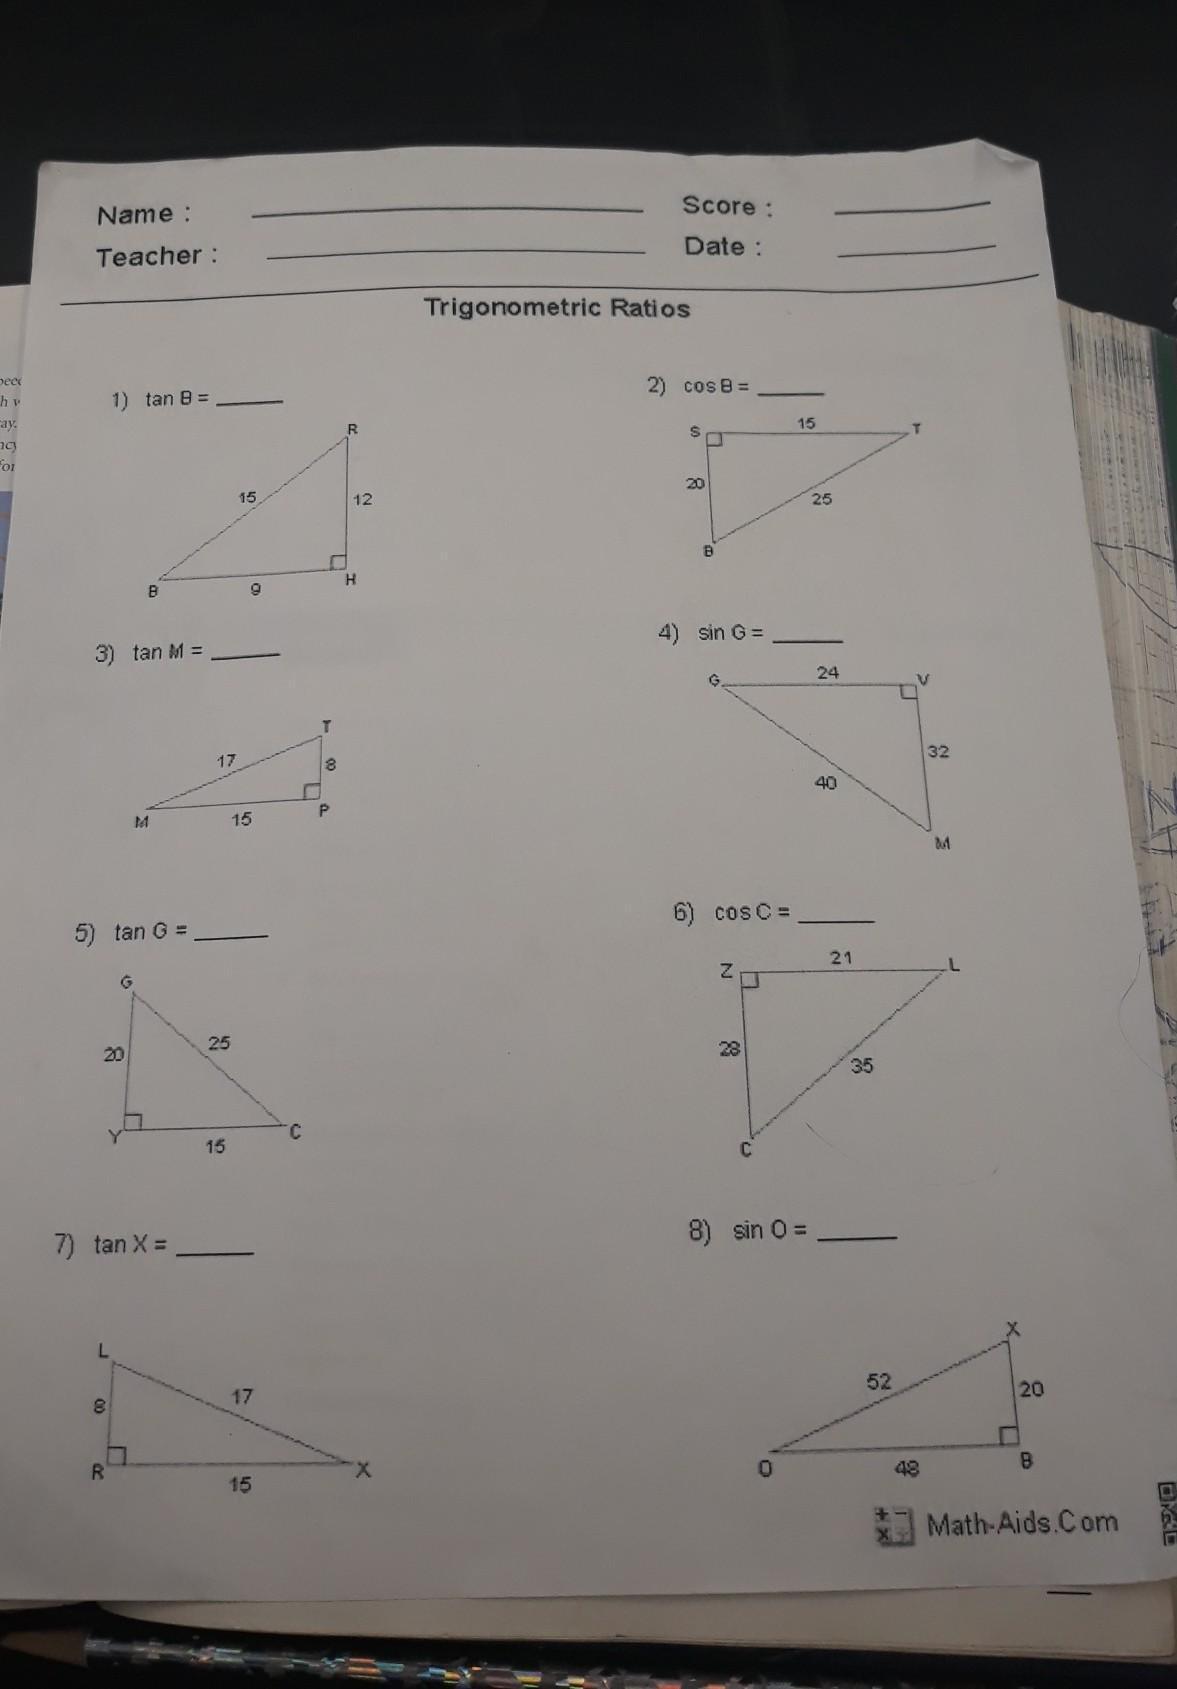 30 Trigonometric Ratios Worksheet Answers